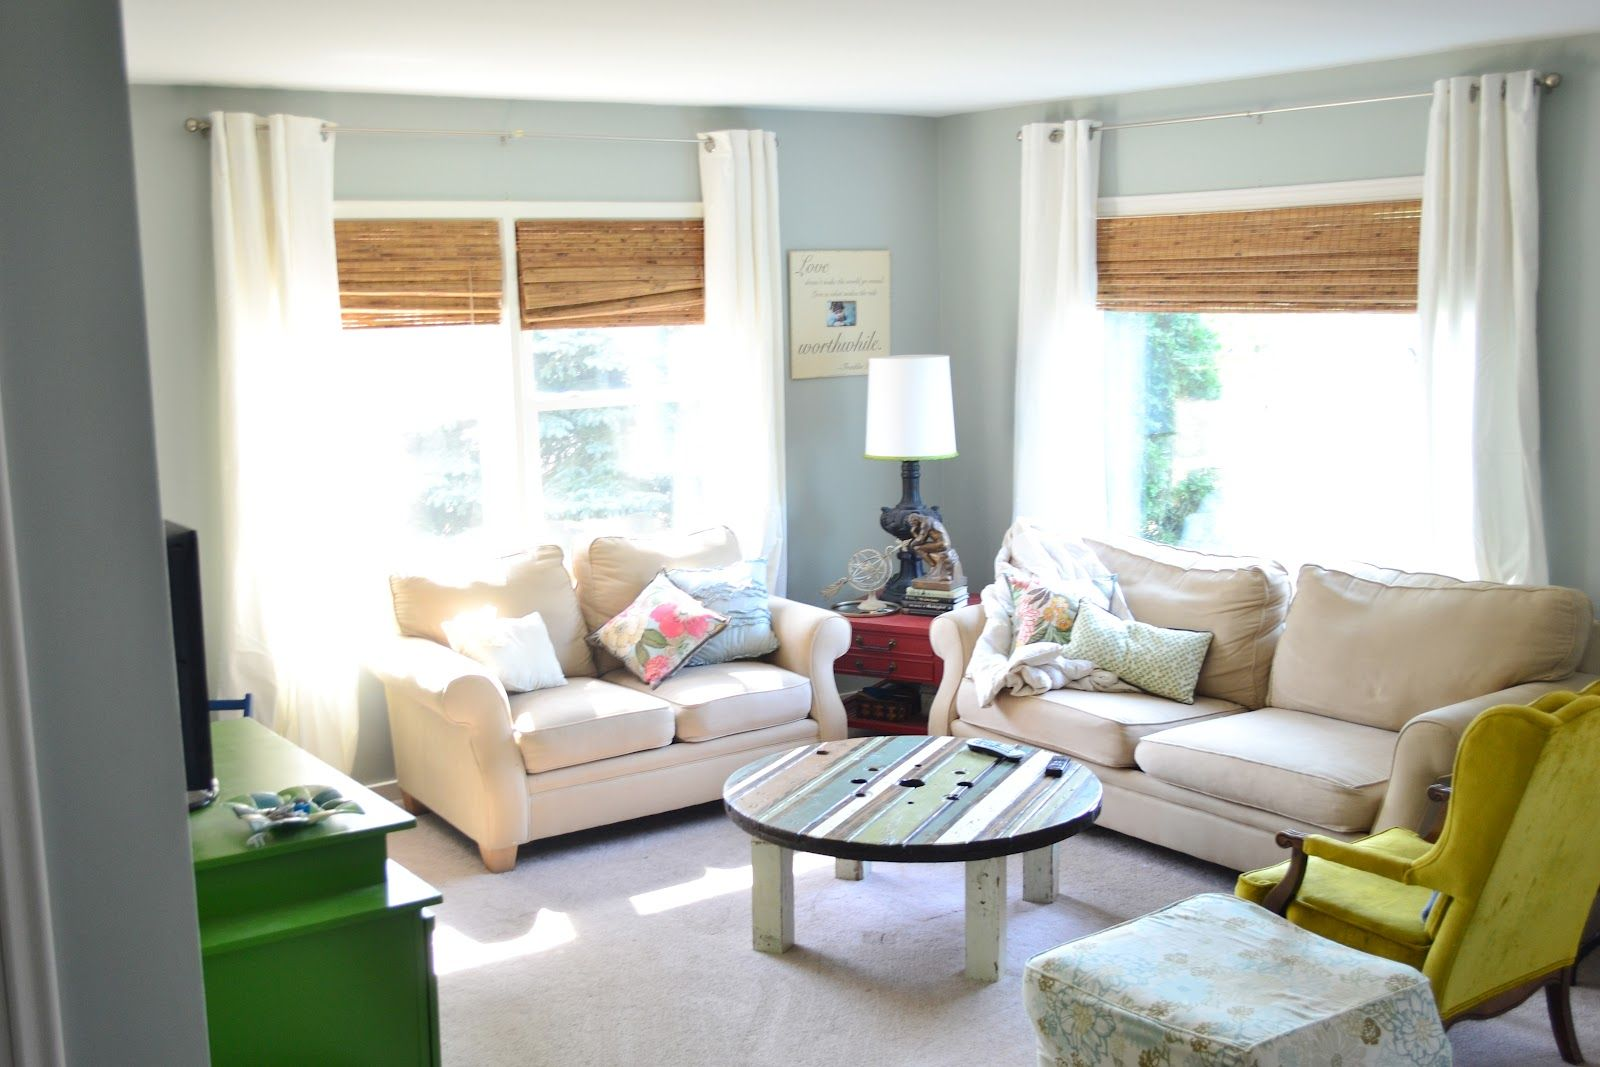 Ikea Living Room Curtains Ikea Merete Curtains Curtain Ideas Pinterest Curtains And Ikea